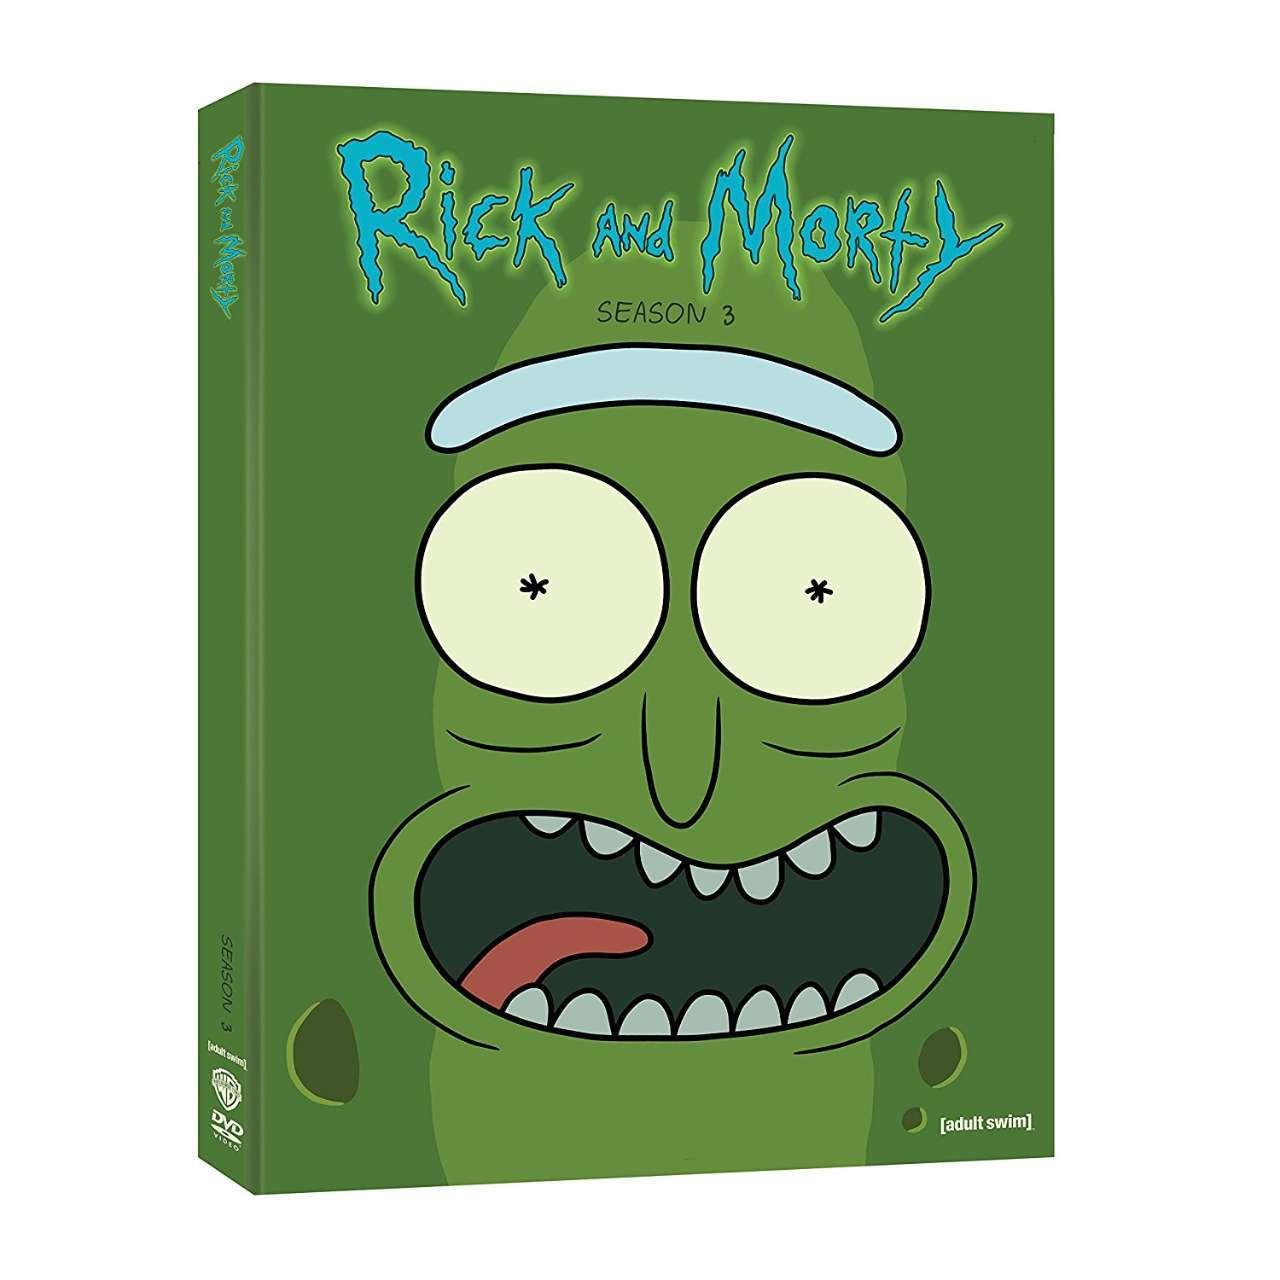 RickAndMortySe3